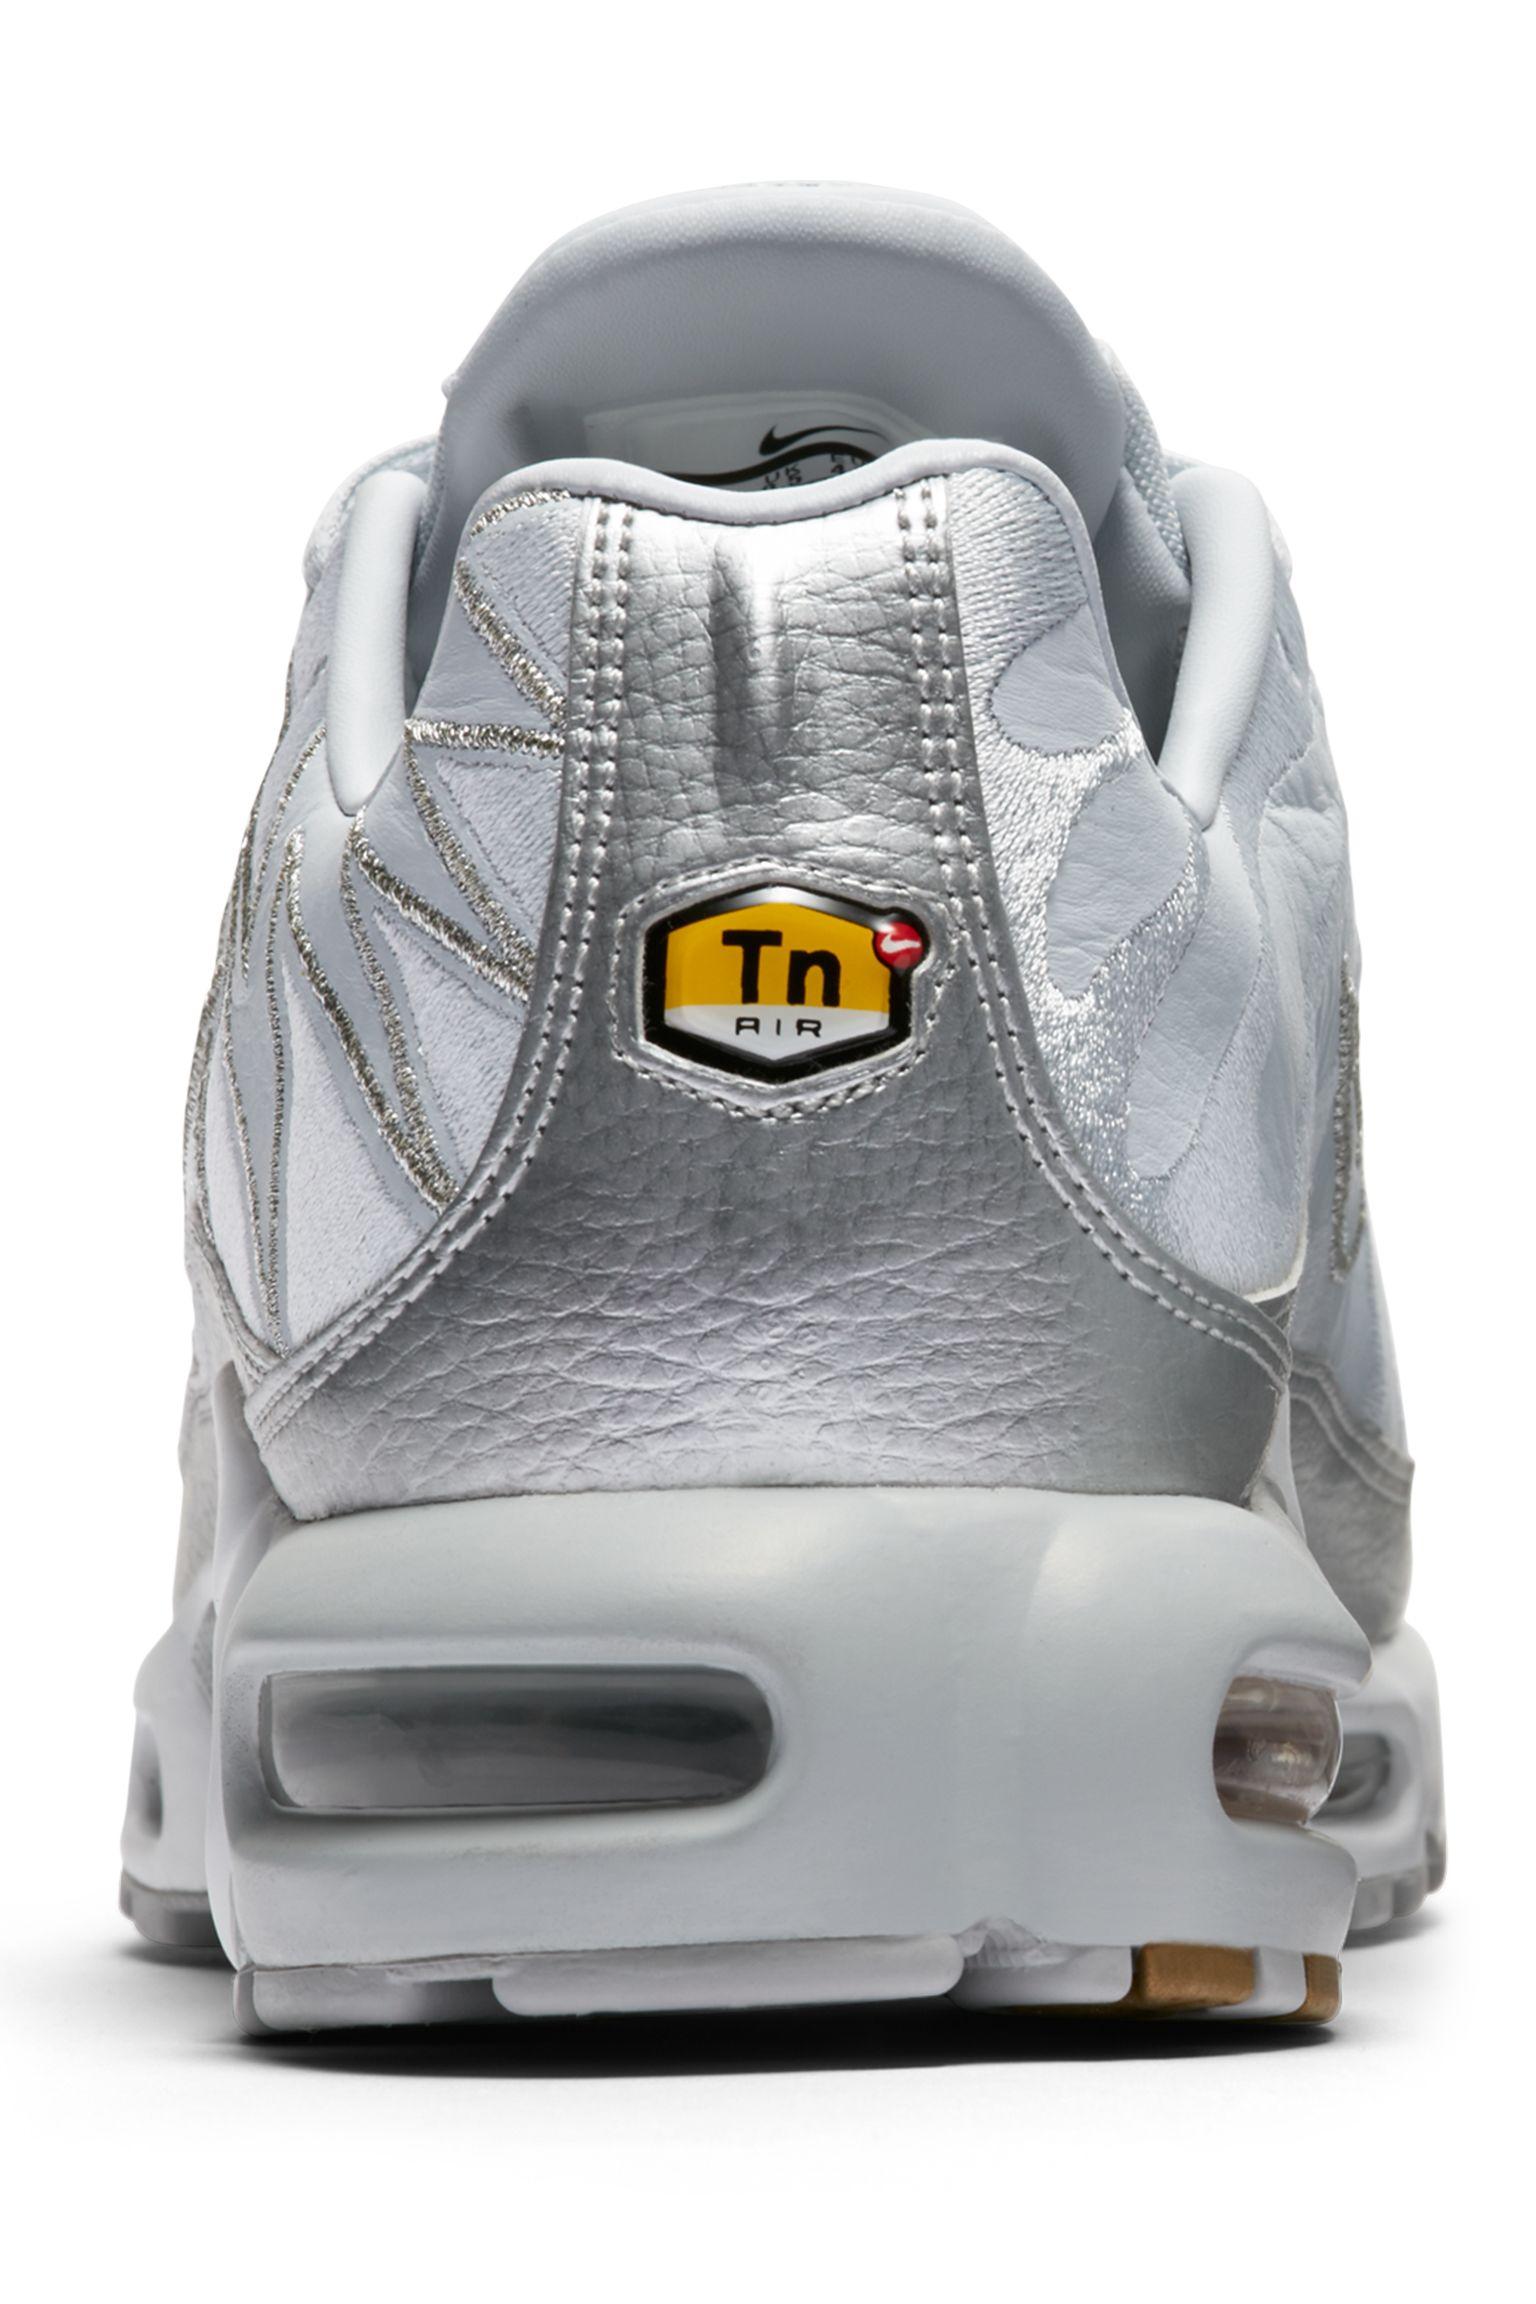 Date de sortie de la Nike Air Max Plus « Pure Platinum ». Nike ...